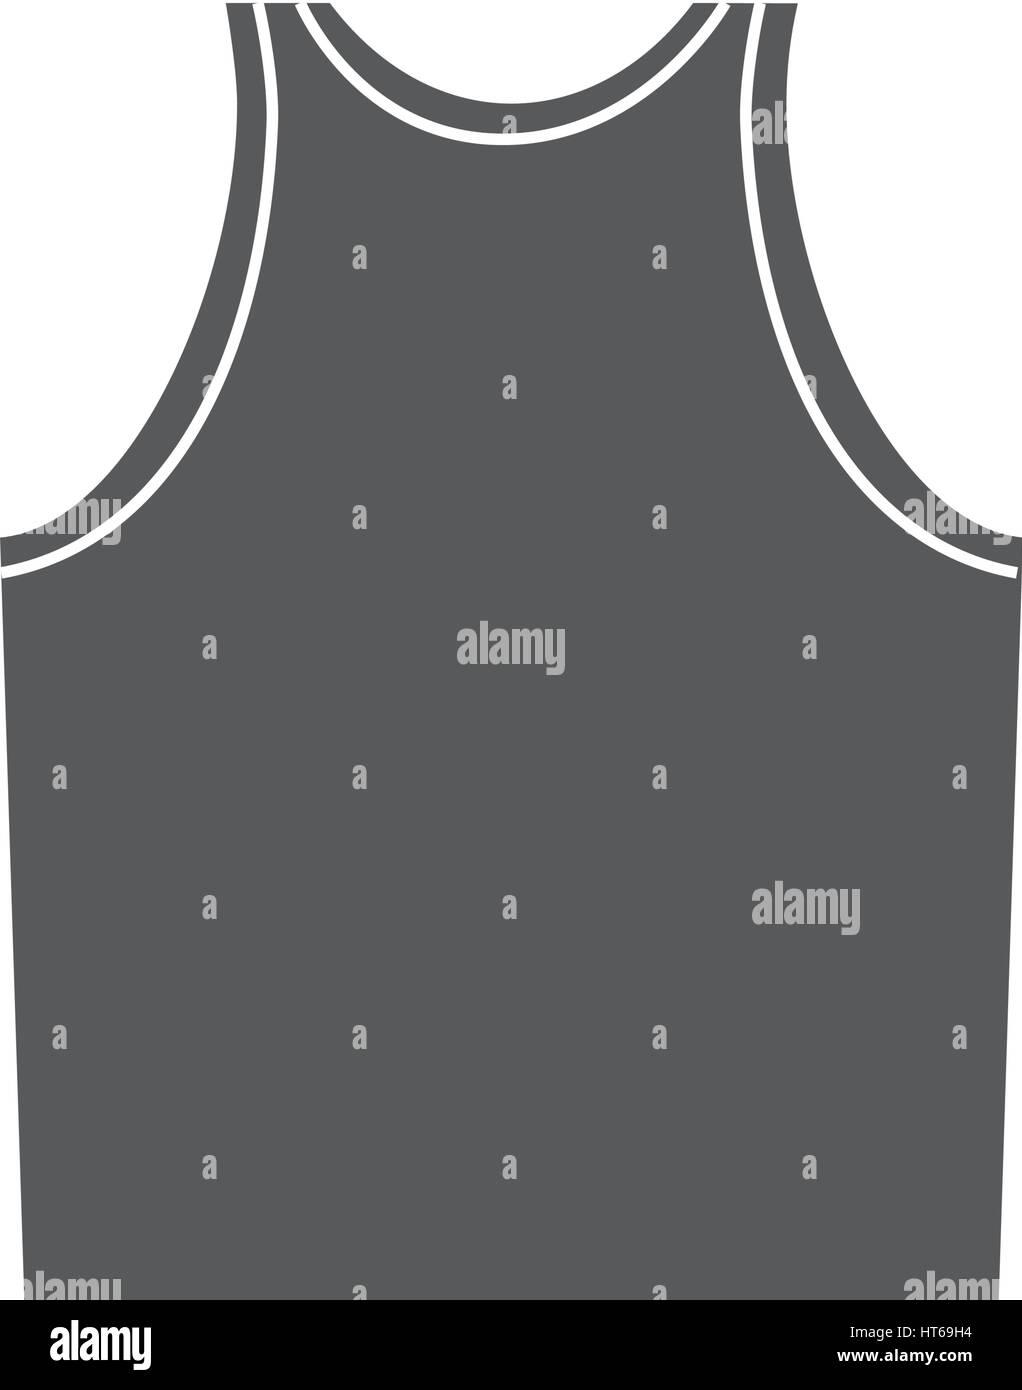 Sleeveless Shirt Stock Vector Images - Alamy 36302ed31